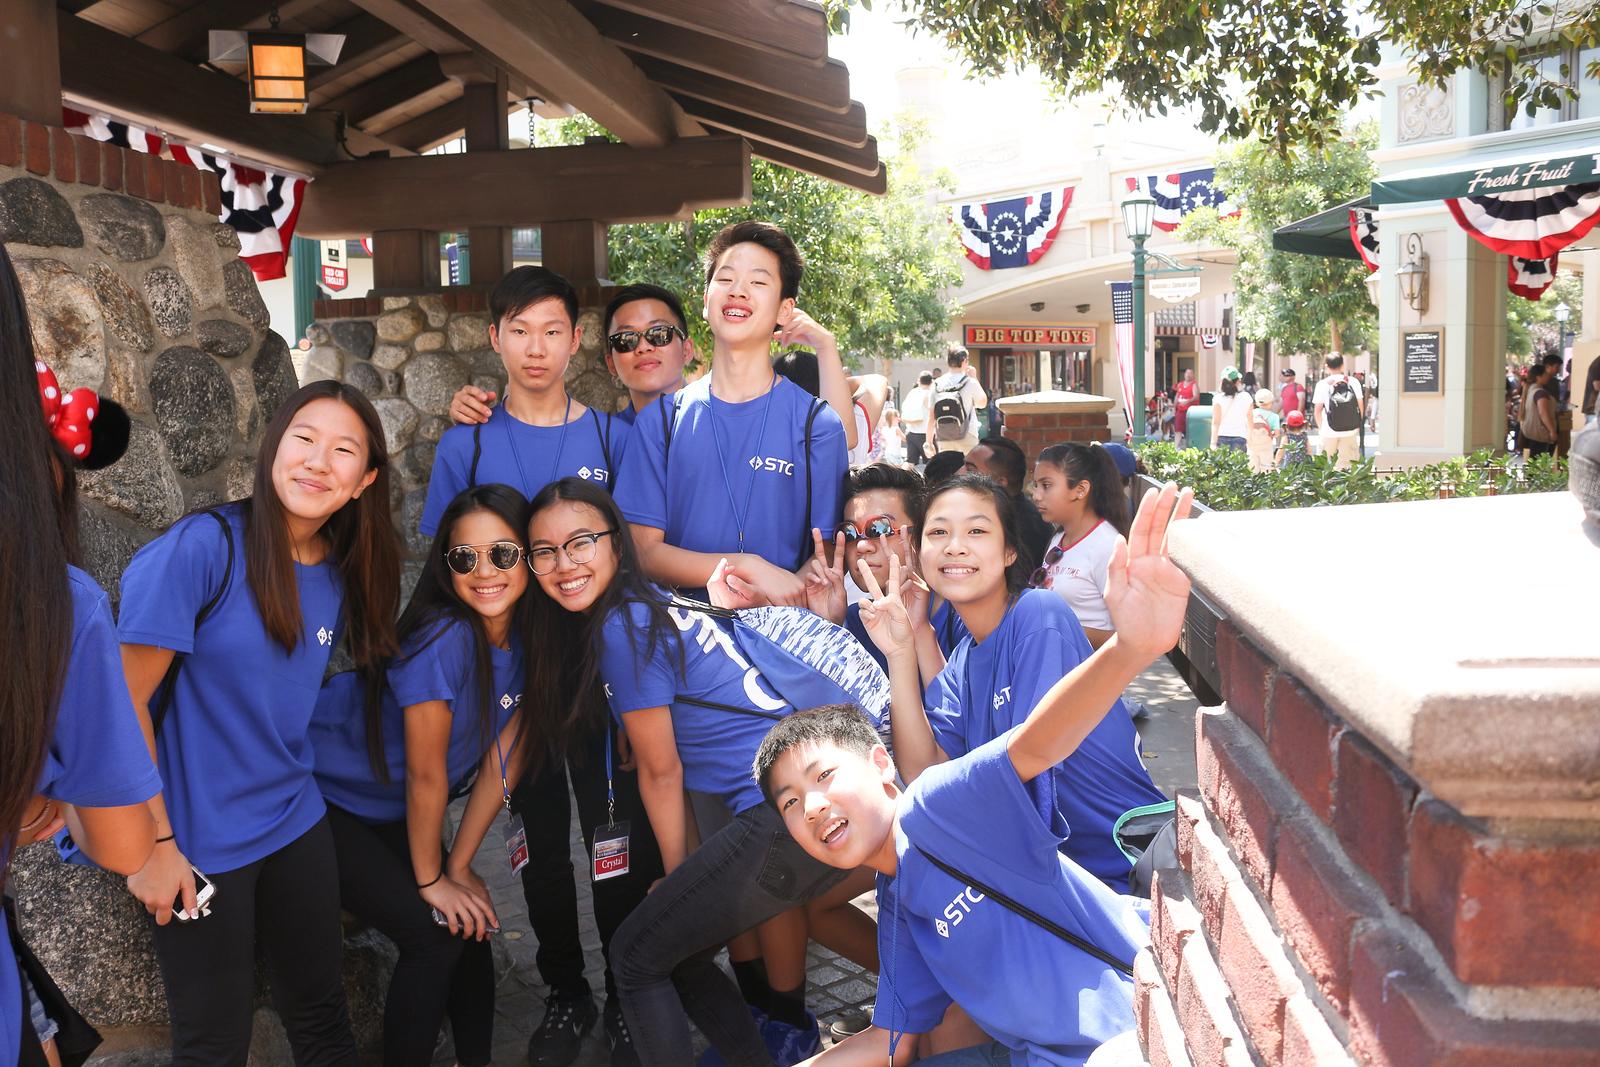 20170727-STC-Youth-Leadership-Disney-137